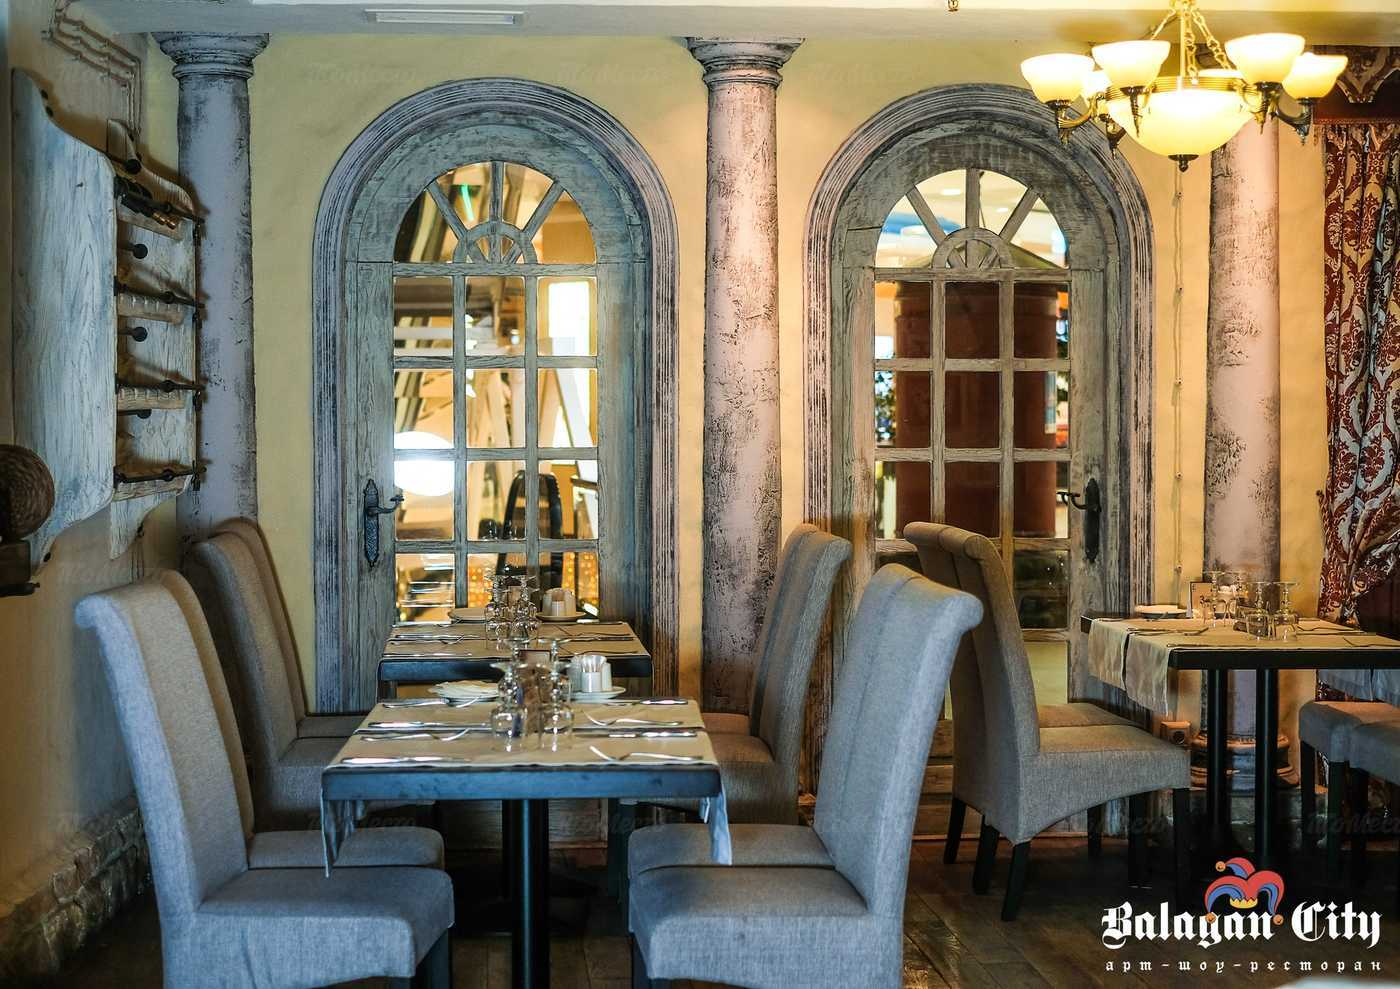 Ресторан Балаган Сити (Balagan City) на Кольцовской улице фото 2